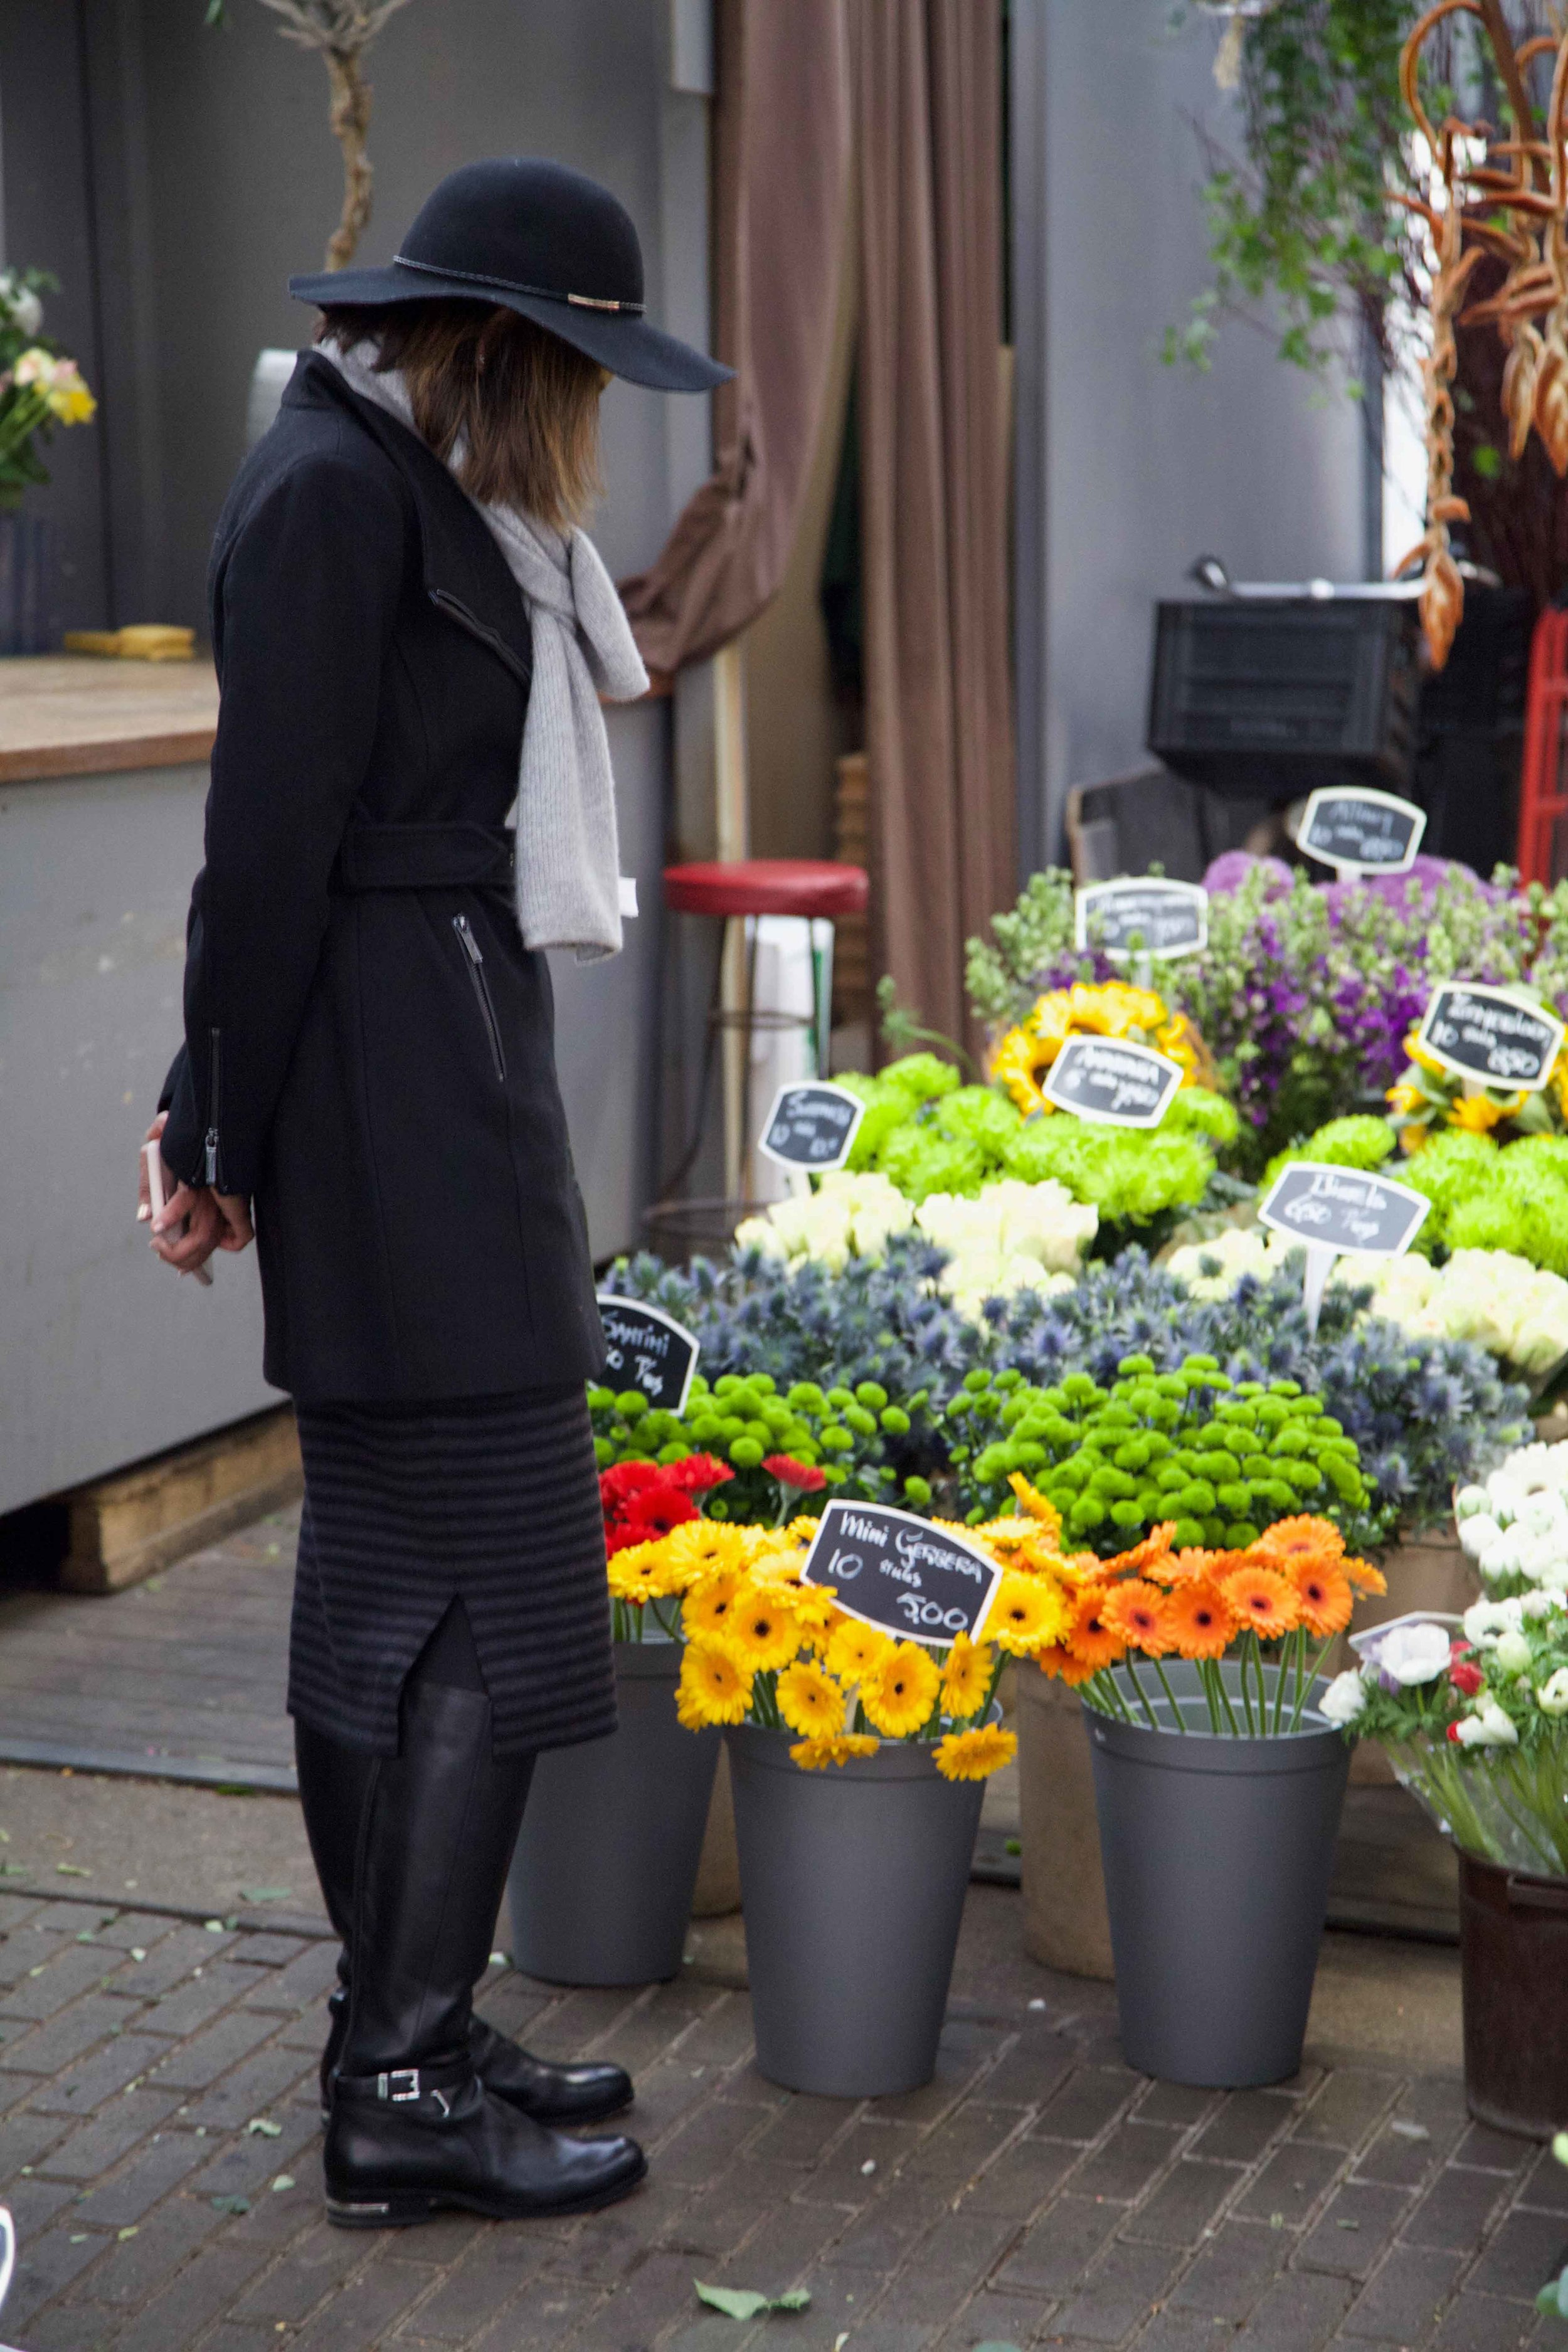 Flower Market,Amsterdam.Photo: Fabio Ricci. Image©thingstodot.com